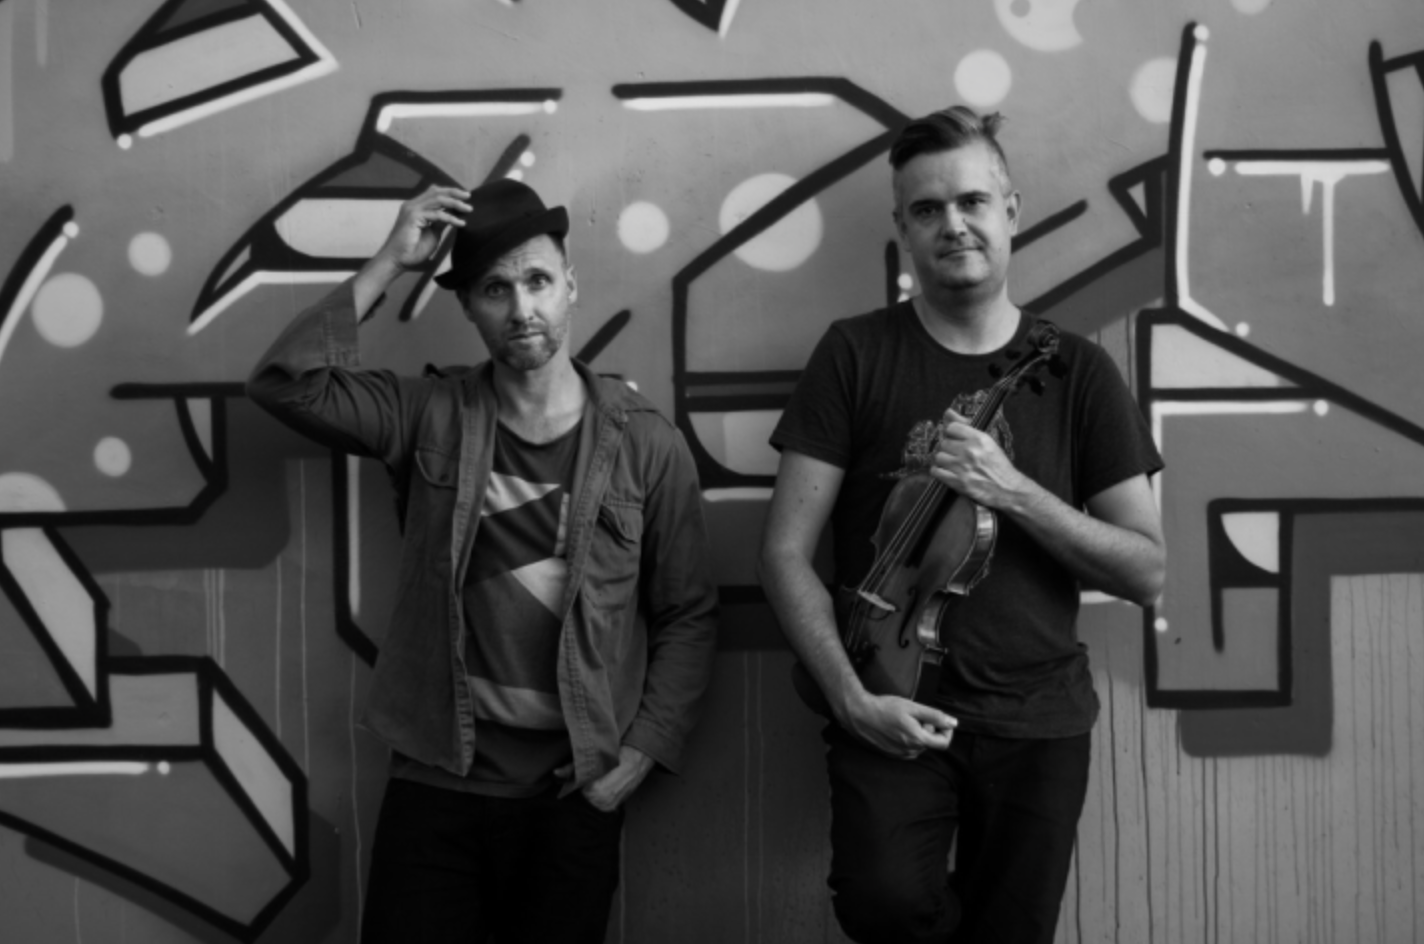 SOUNDTRAK | Ben Walsh & Shenzo Gregorio - SATURDAY SEPTEMBER 14th, 2019#liveatdust #jazzatdust #worldatdustLEARN MORE